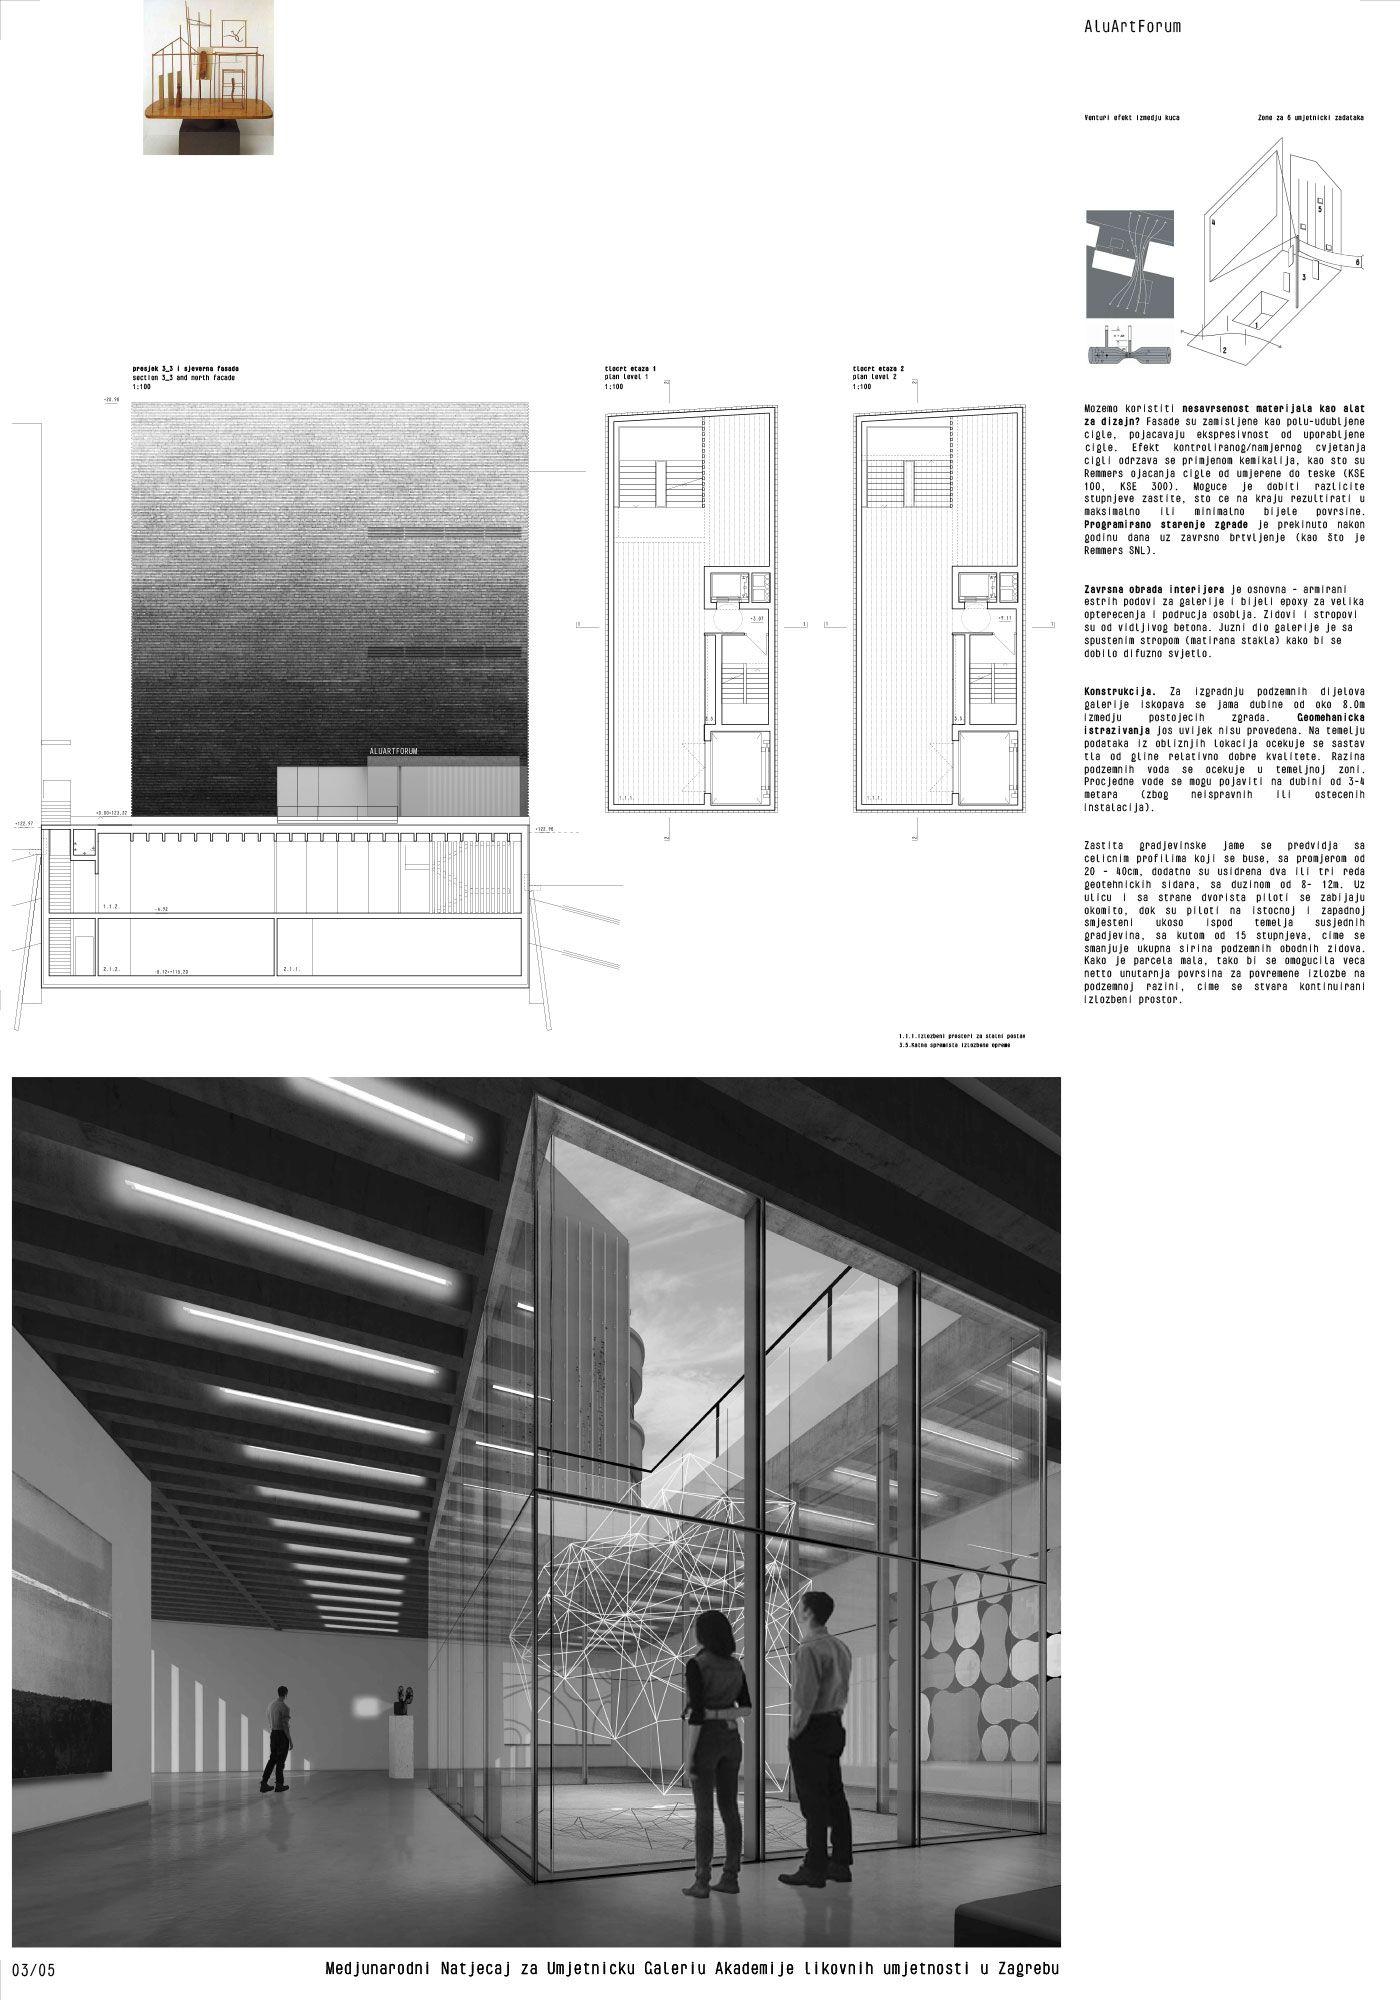 Njiric Arhitekti Aluartforum Art Gallery Art Academy Architecture Board